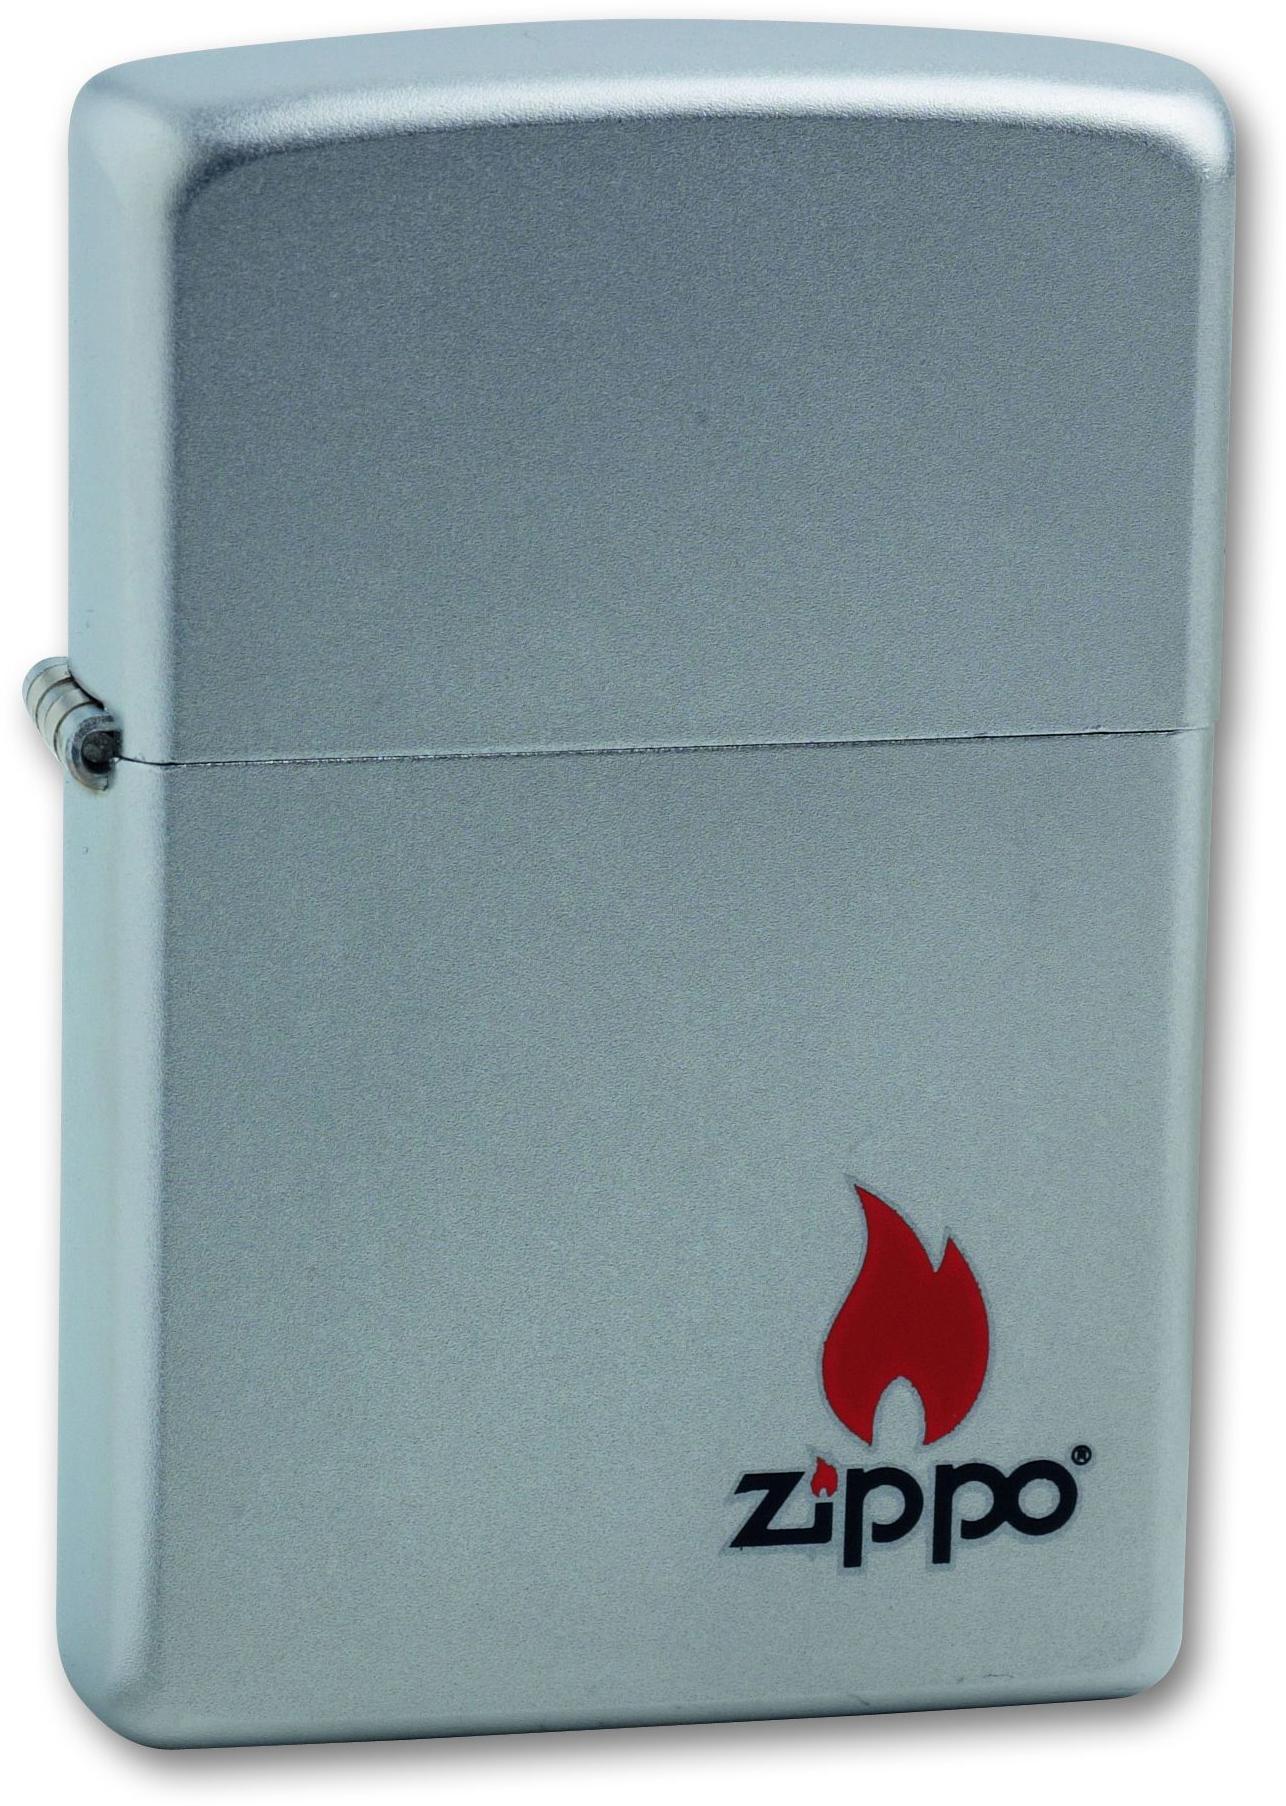 Зажигалка ZIPPO Satin Chrome, латунь с ник.-хром. покрыт.,серебр.,матовая, 36х56х12мм